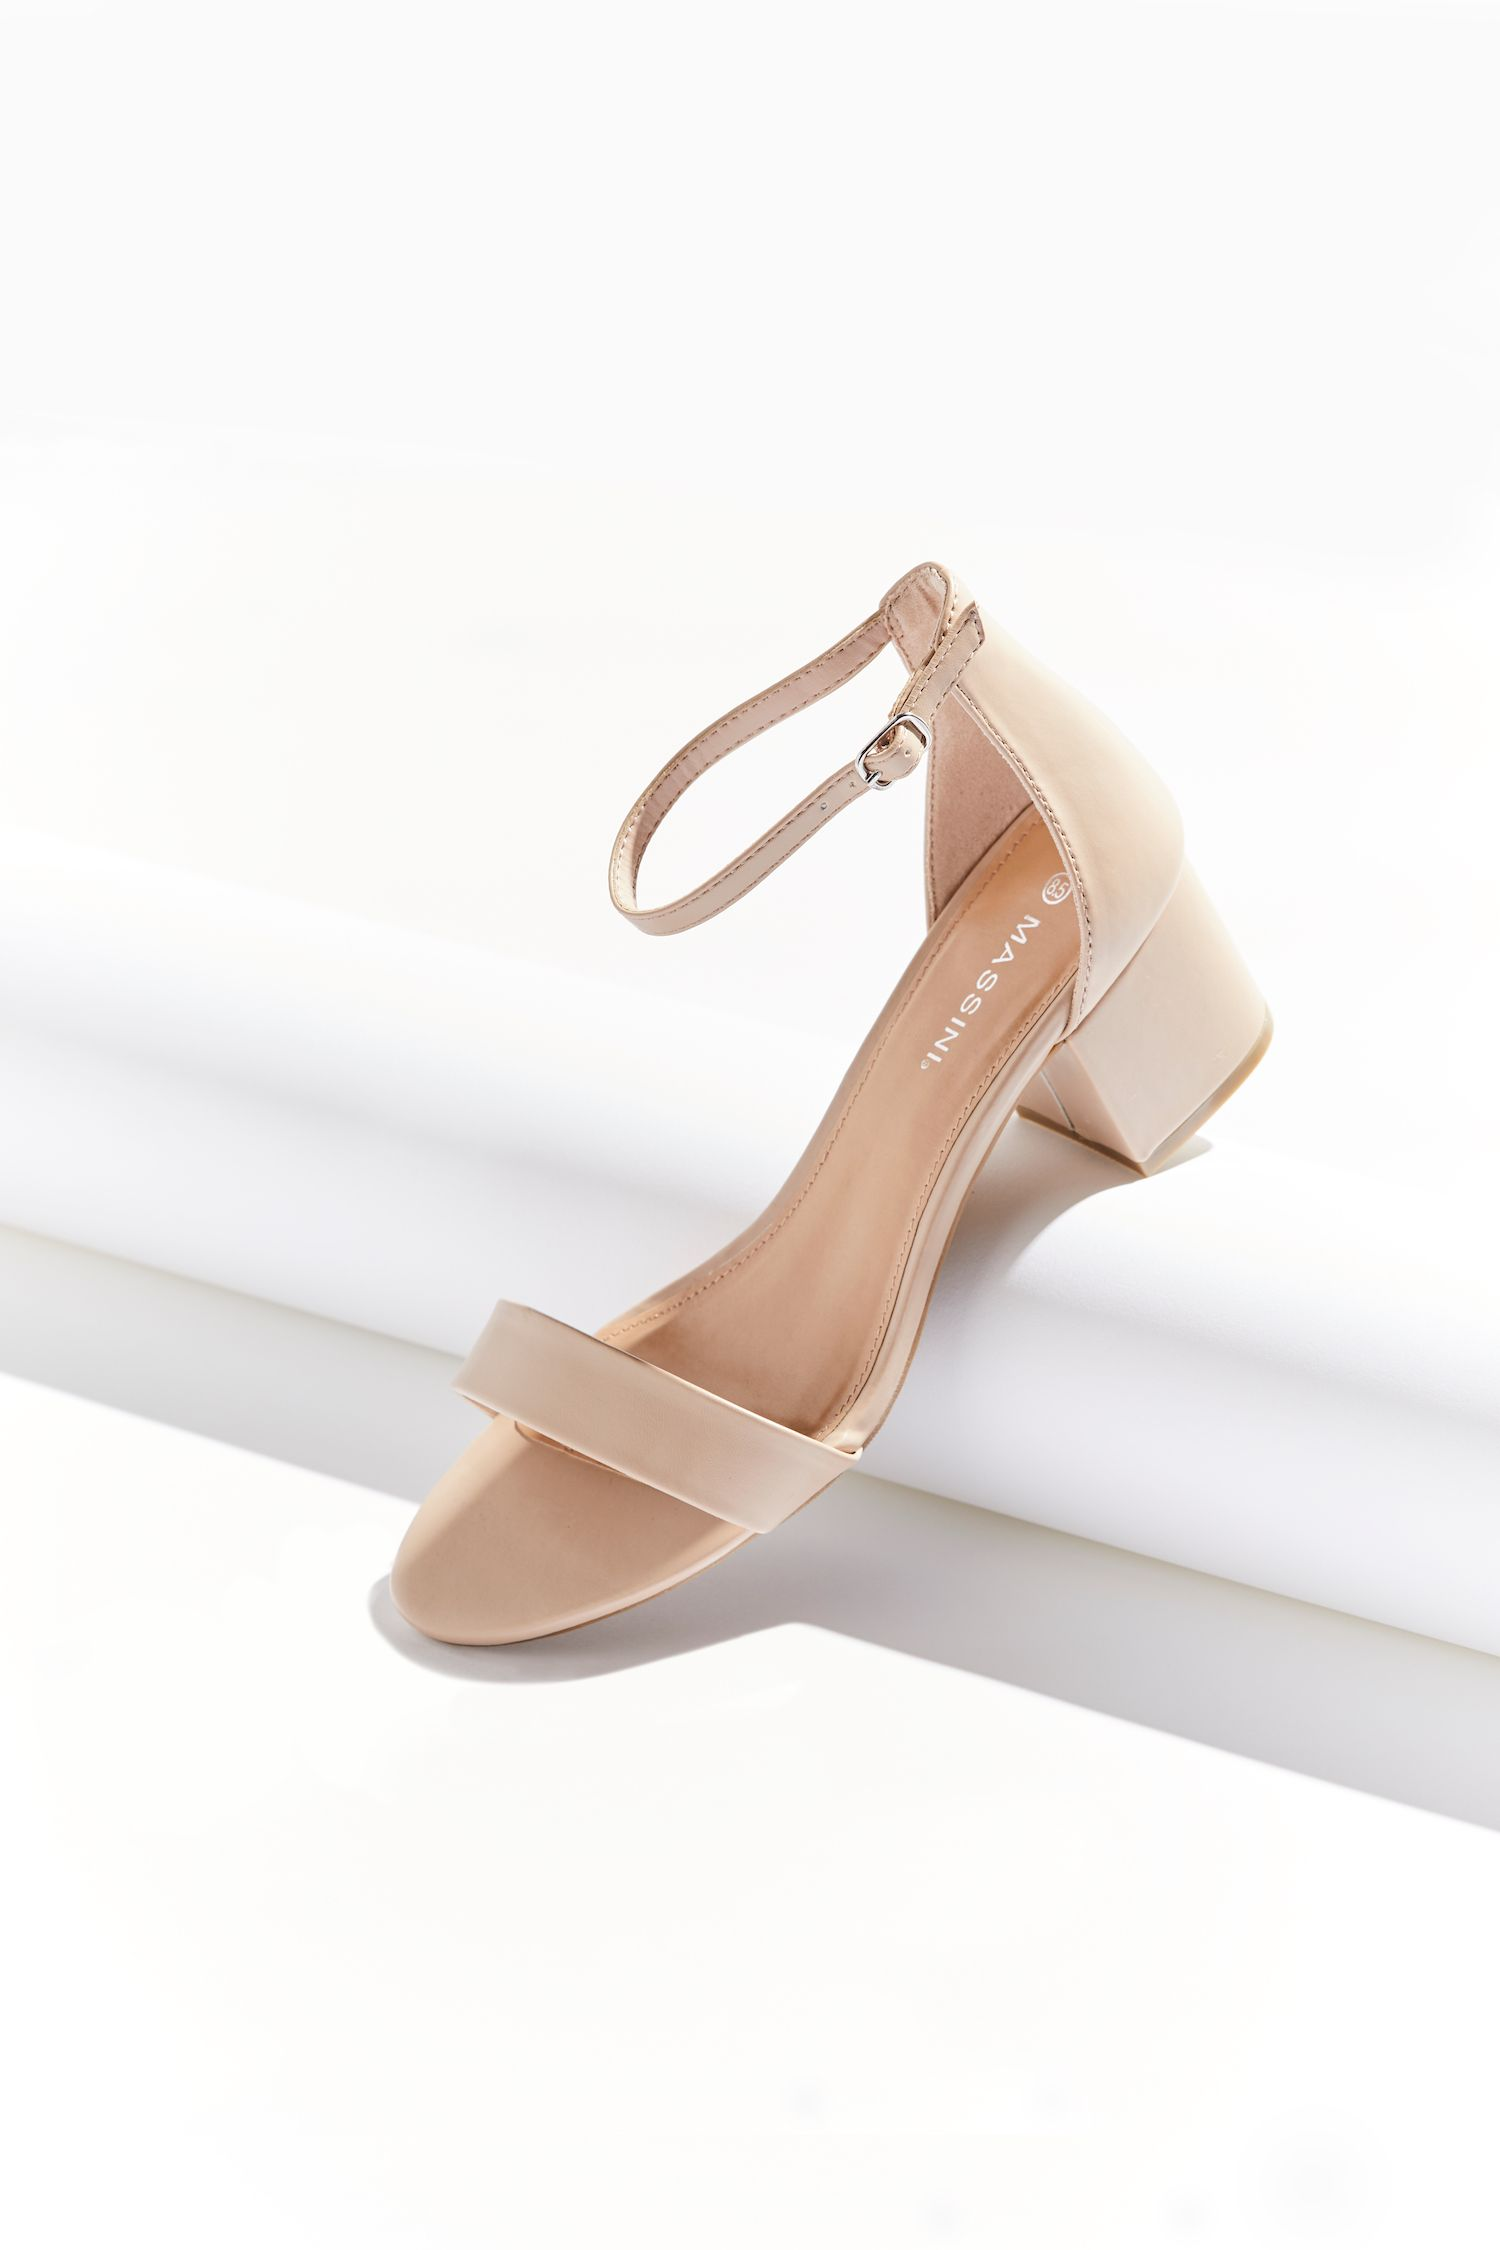 NBH_DANA_Off Figure Testing_Shoes_1107 copy.jpg